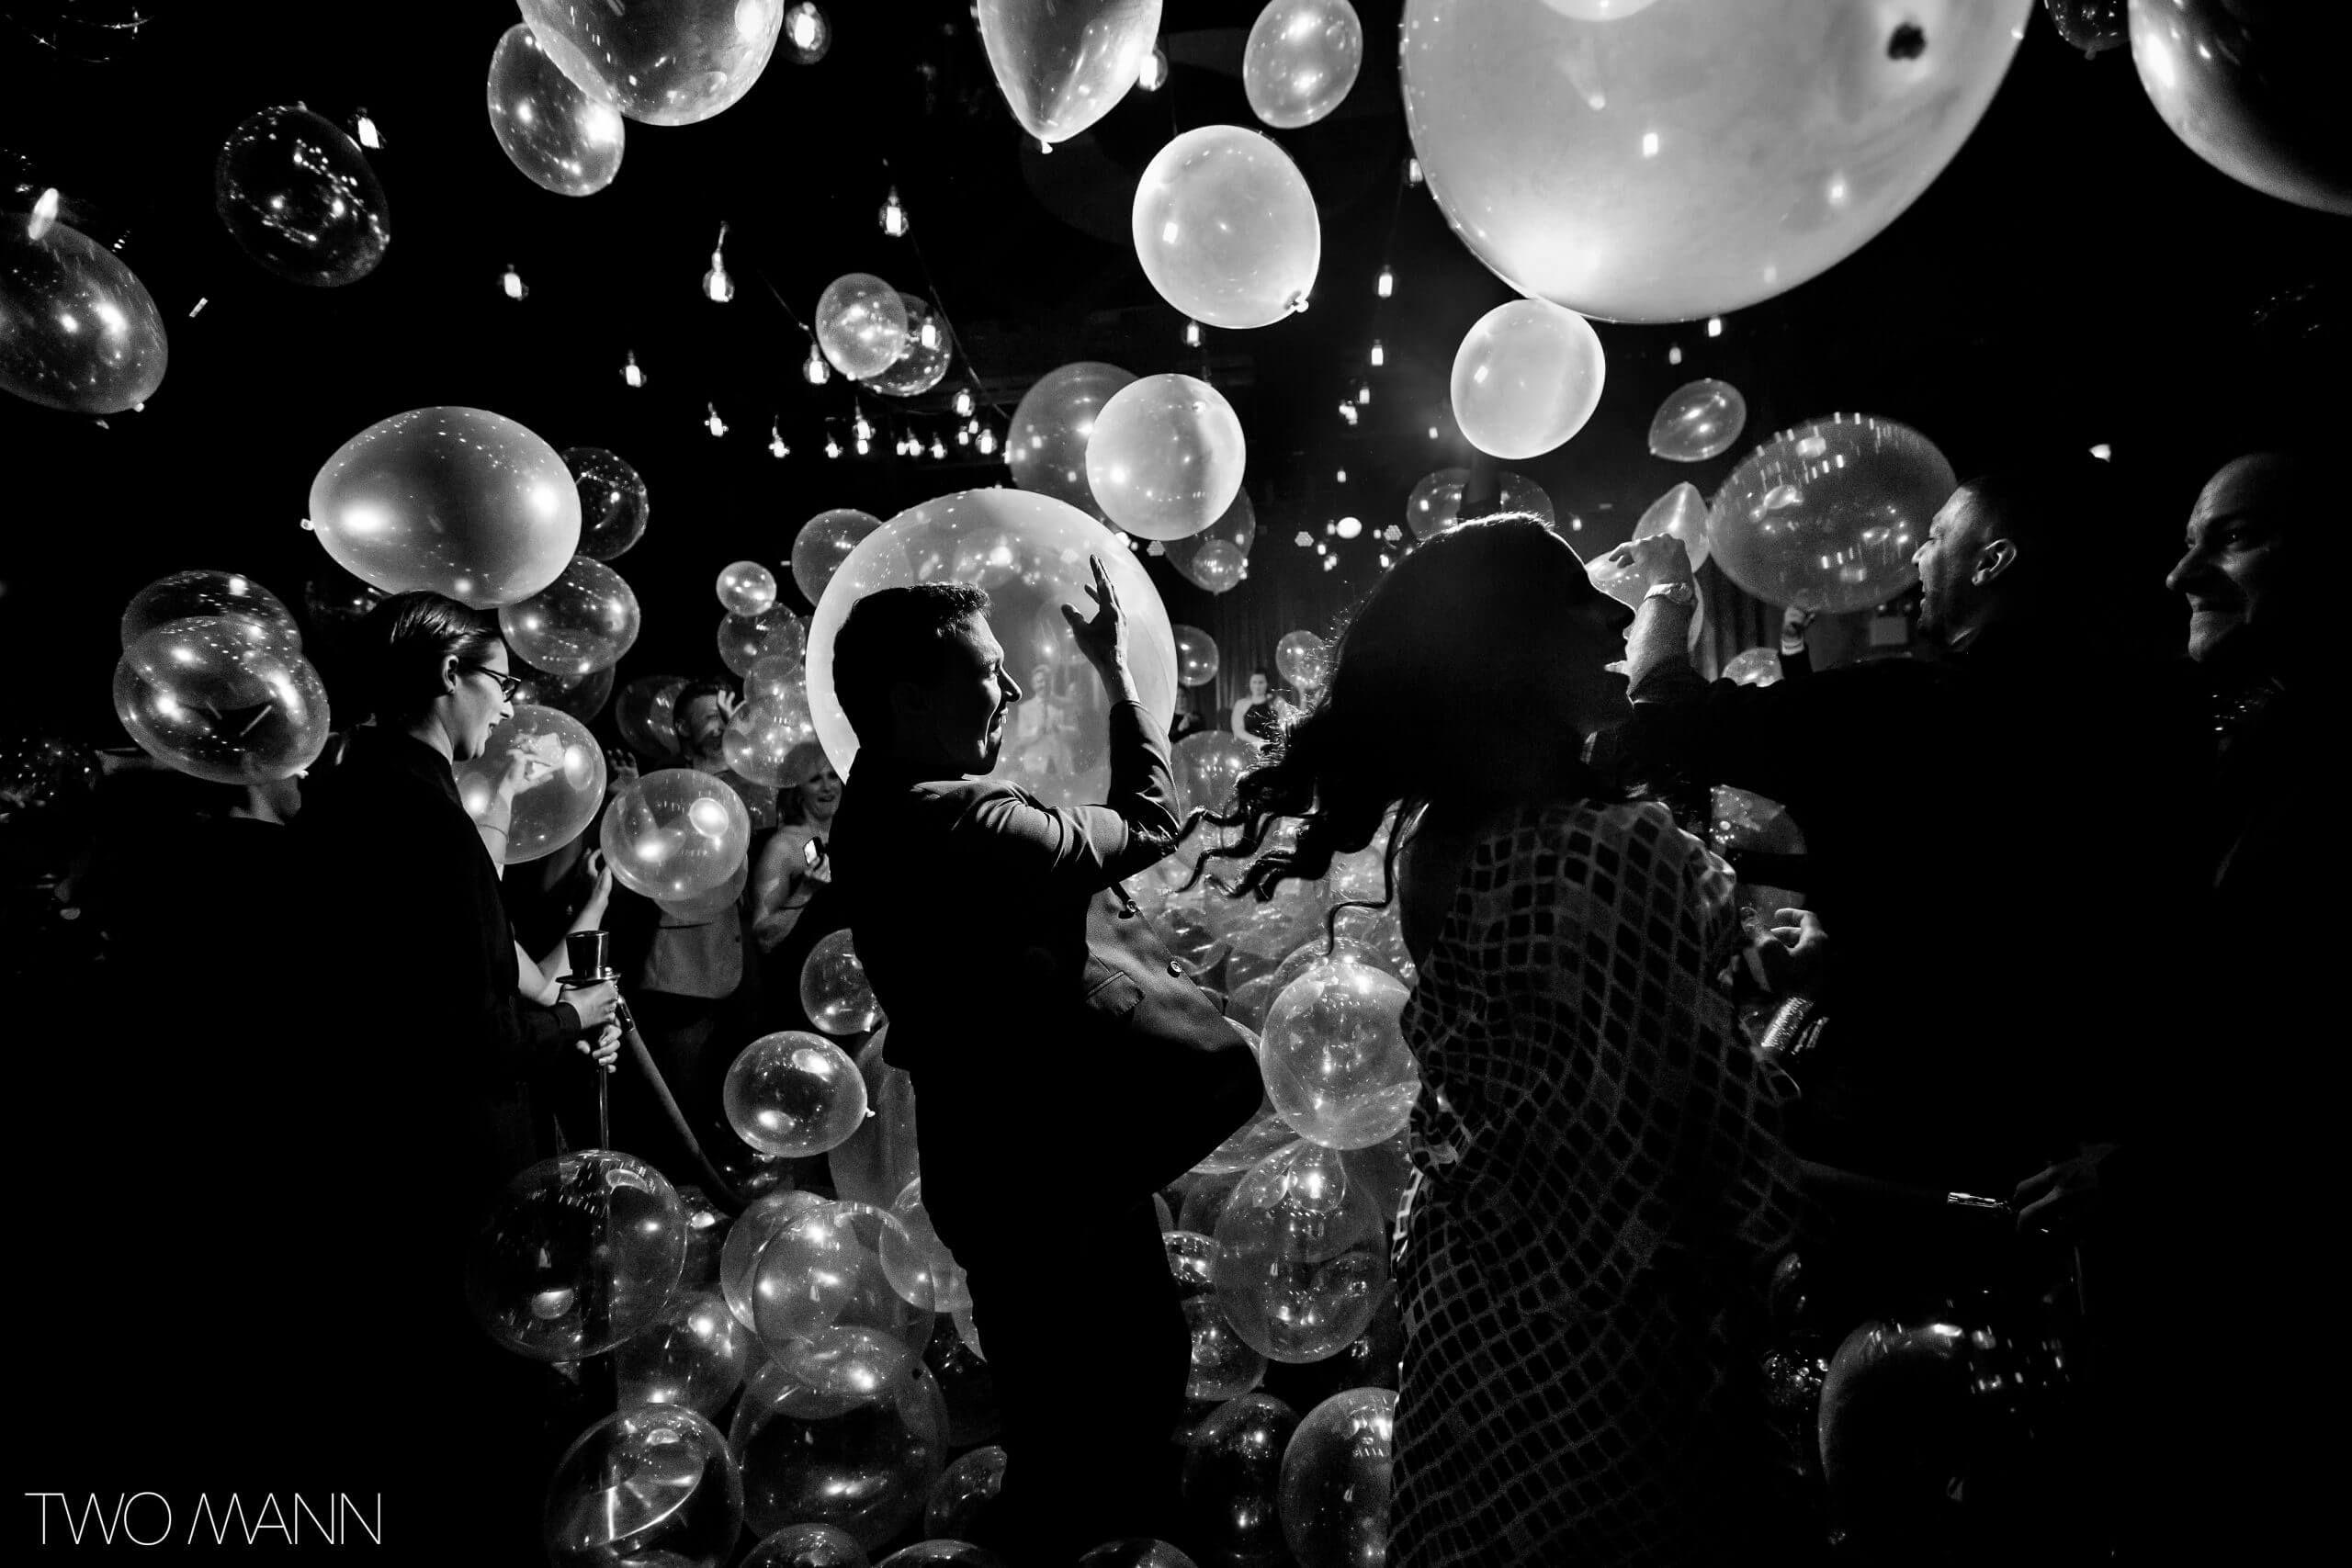 Pin on Photography - Love & Weddings